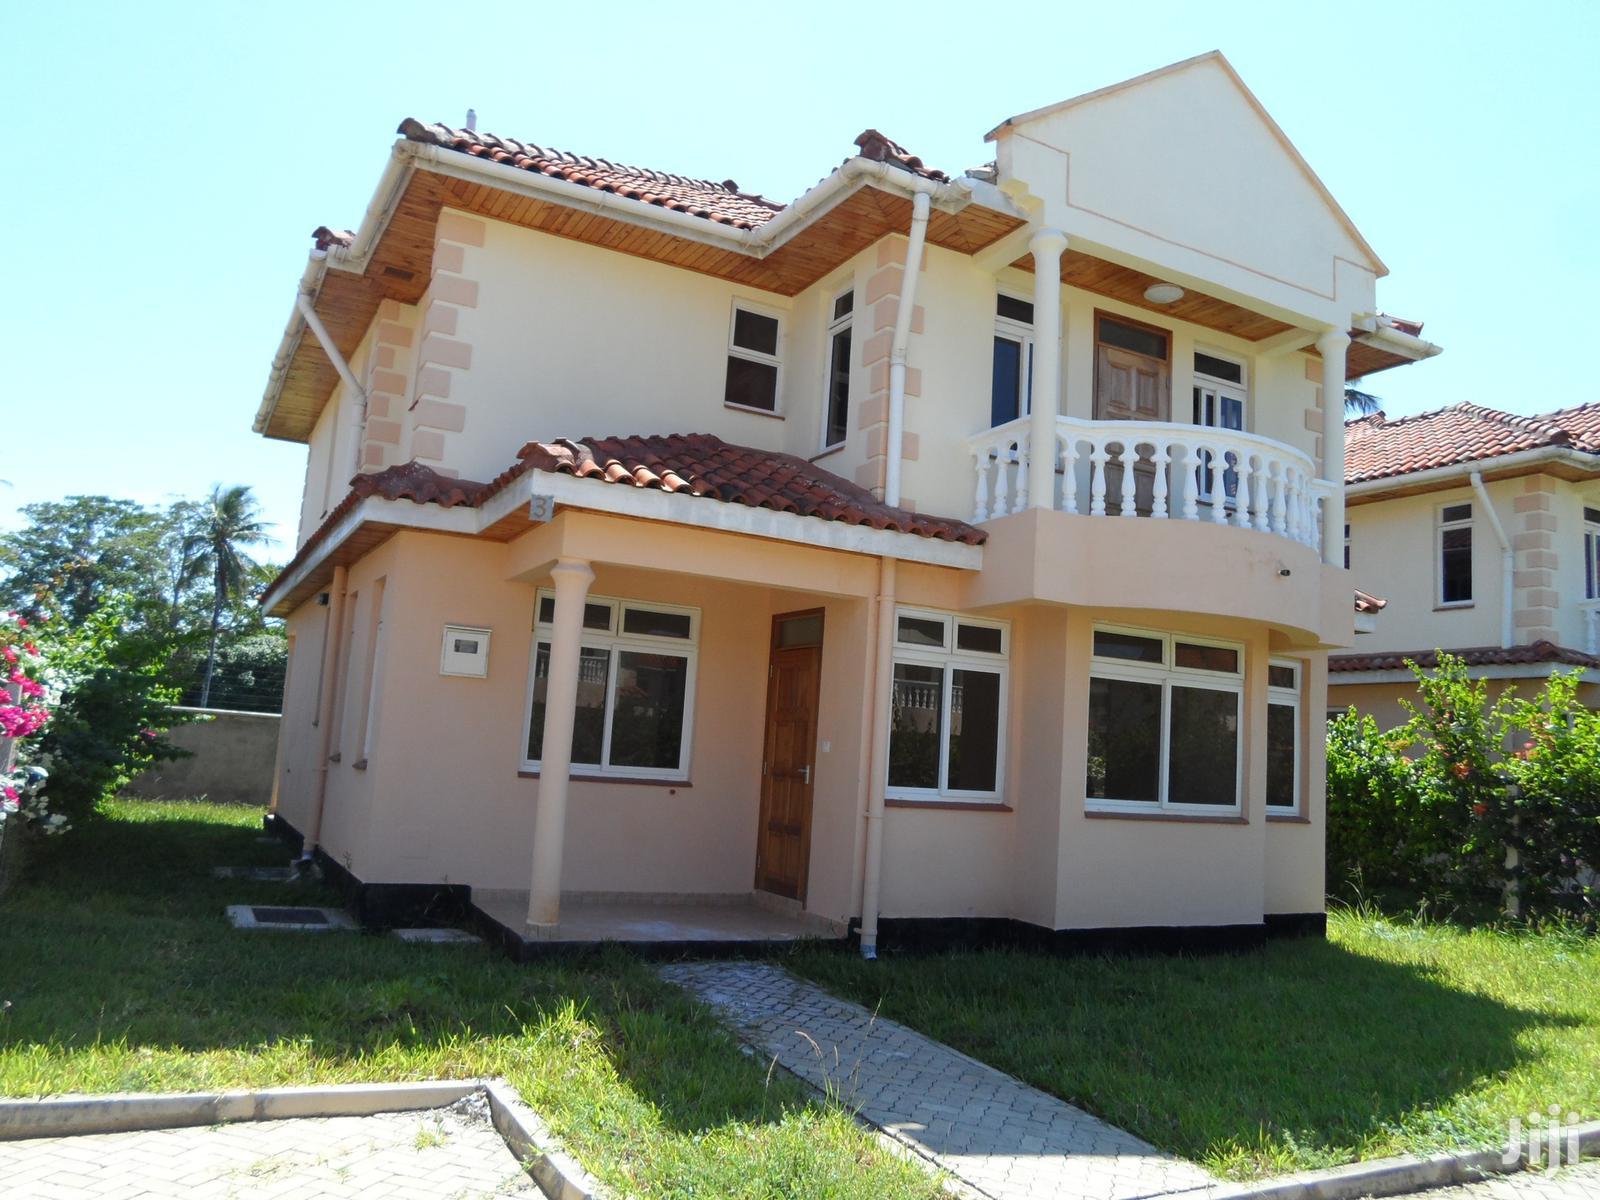 4br Villa On Sale Mtwapa/Benford Homes